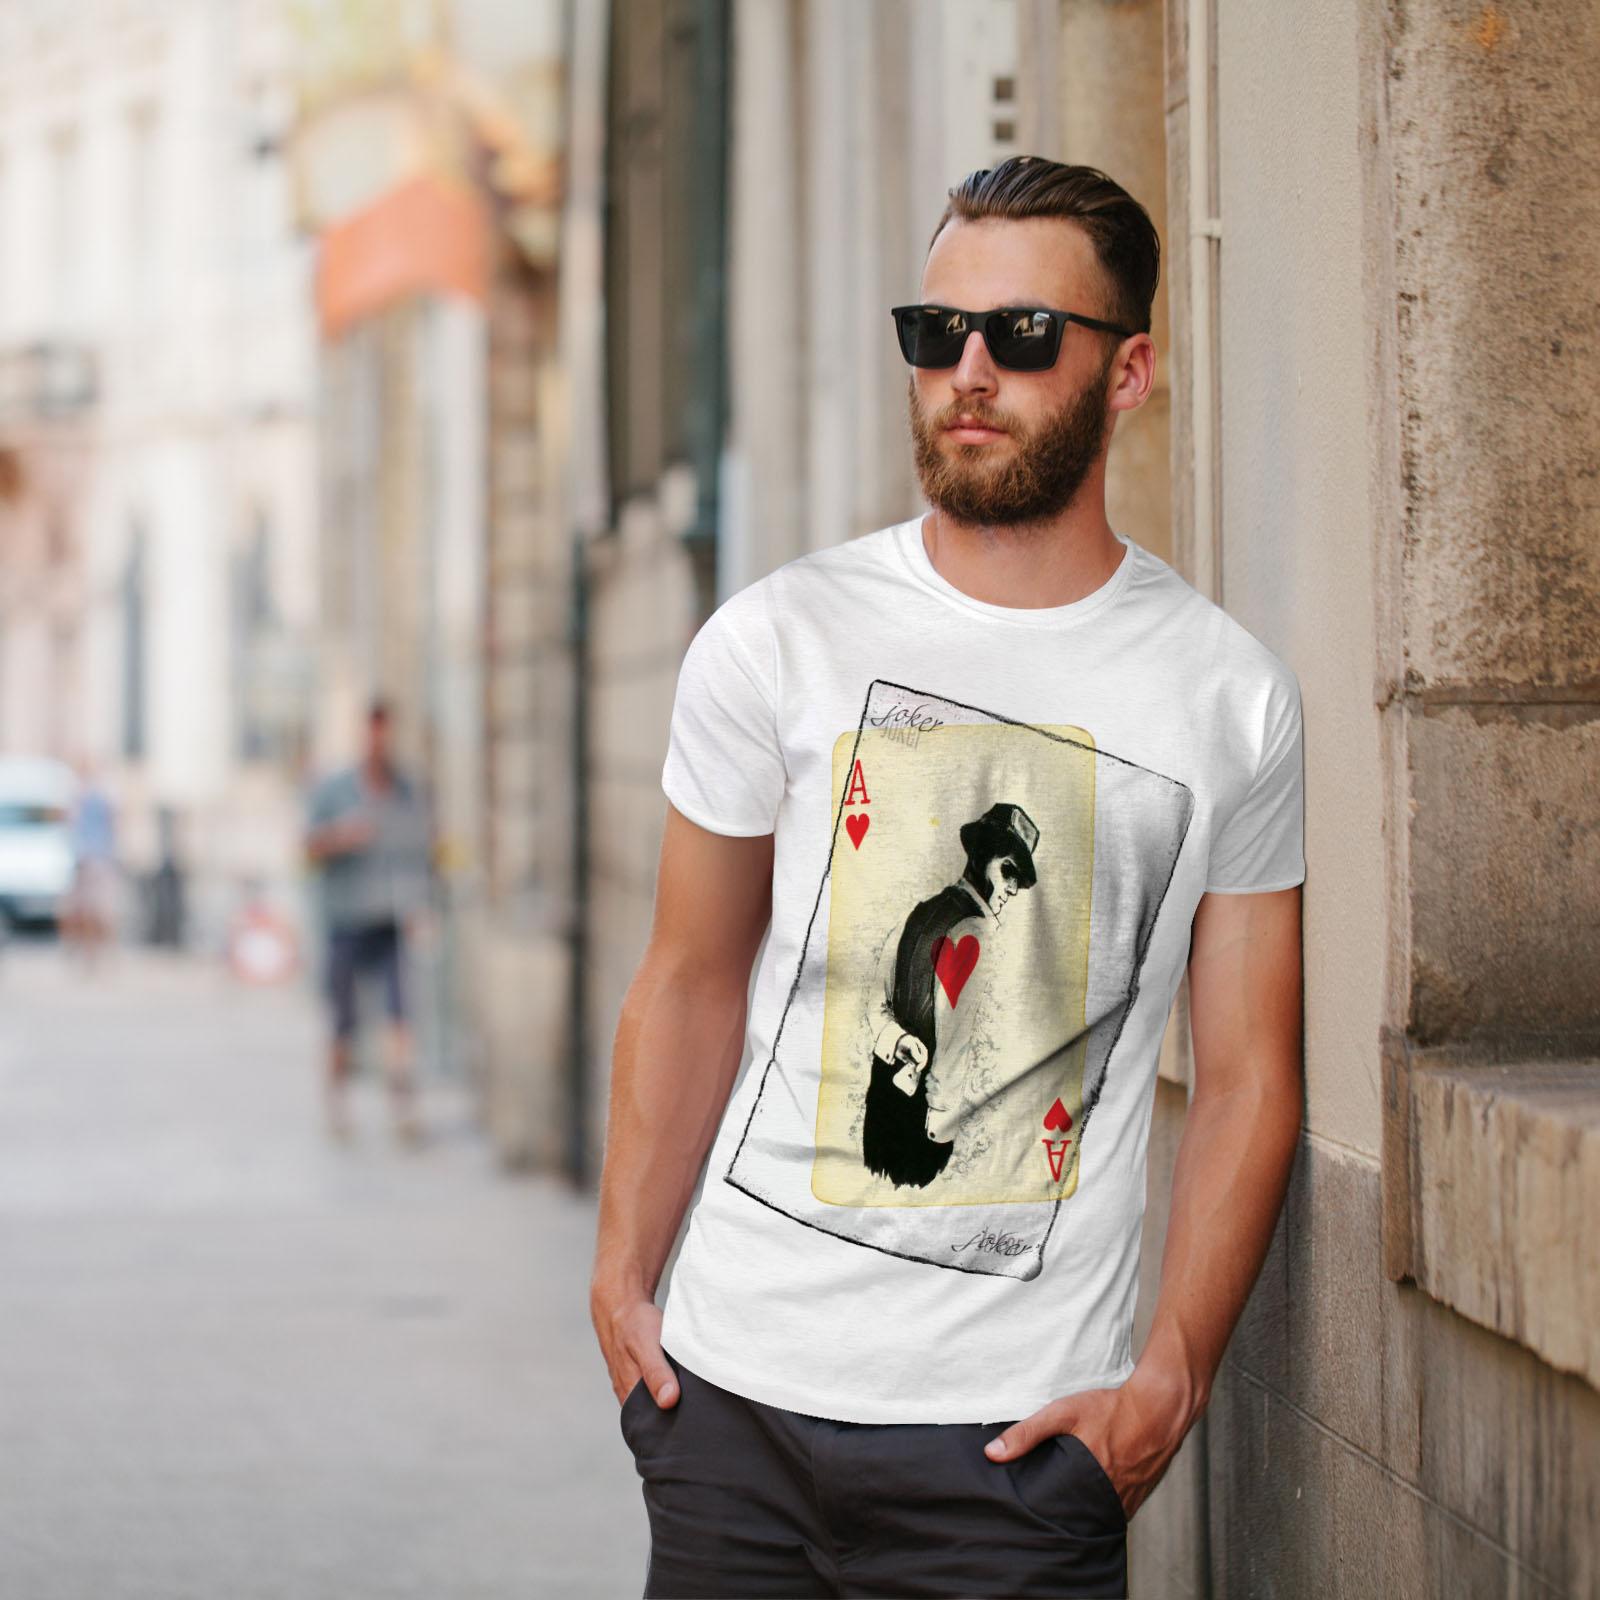 Wellcoda-POKER-misterioso-Da-Uomo-T-shirt-Gamble-design-grafico-stampato-T-shirt miniatura 11